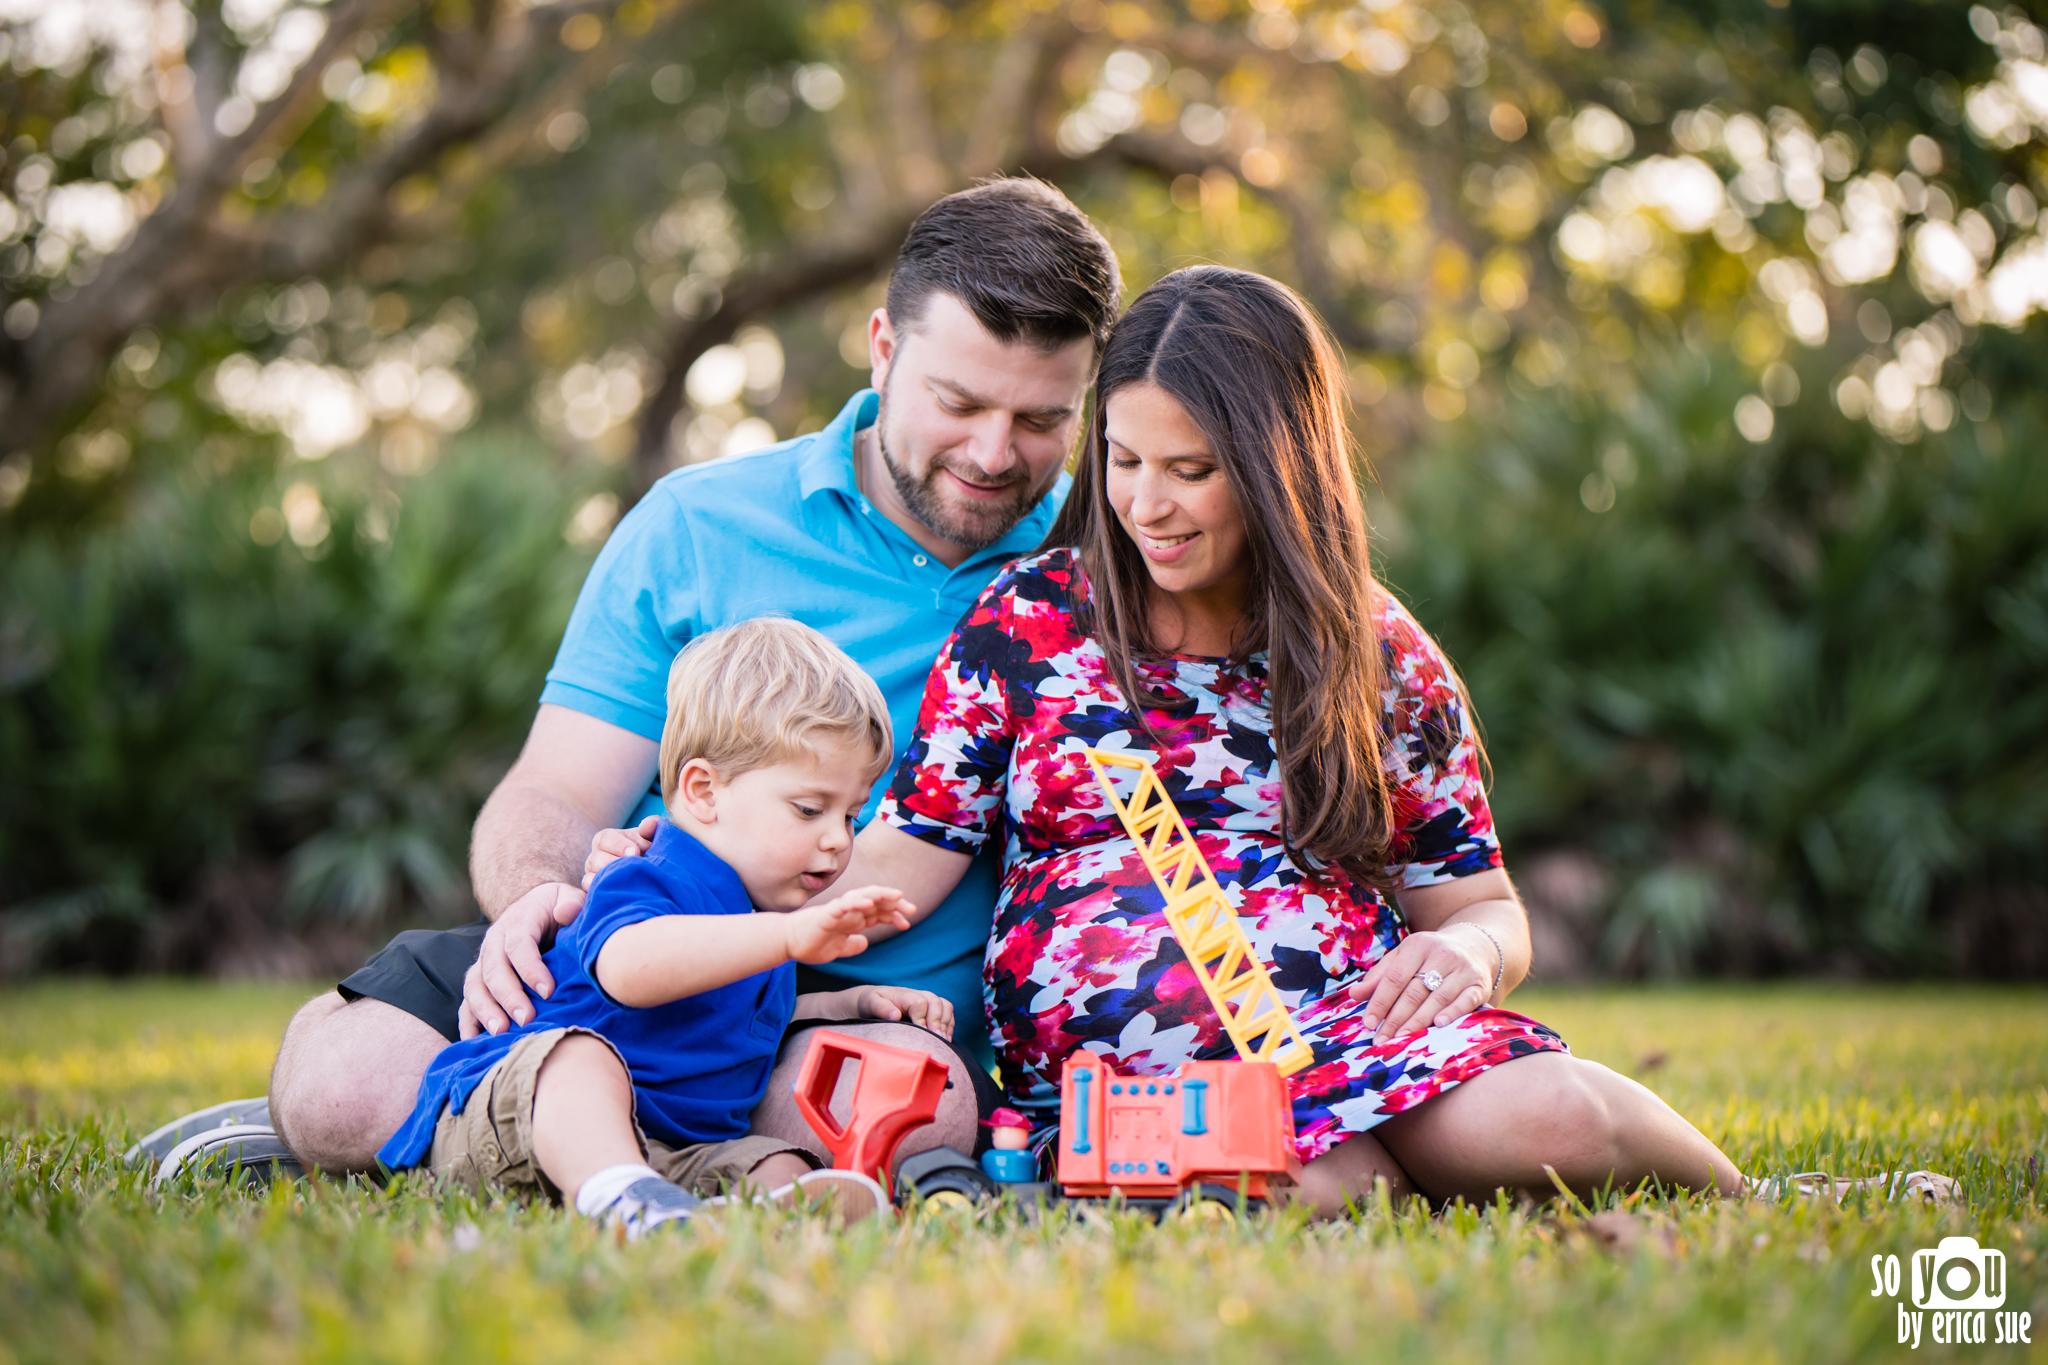 maternity-matheson-hammock-family-of-three-5641.jpg